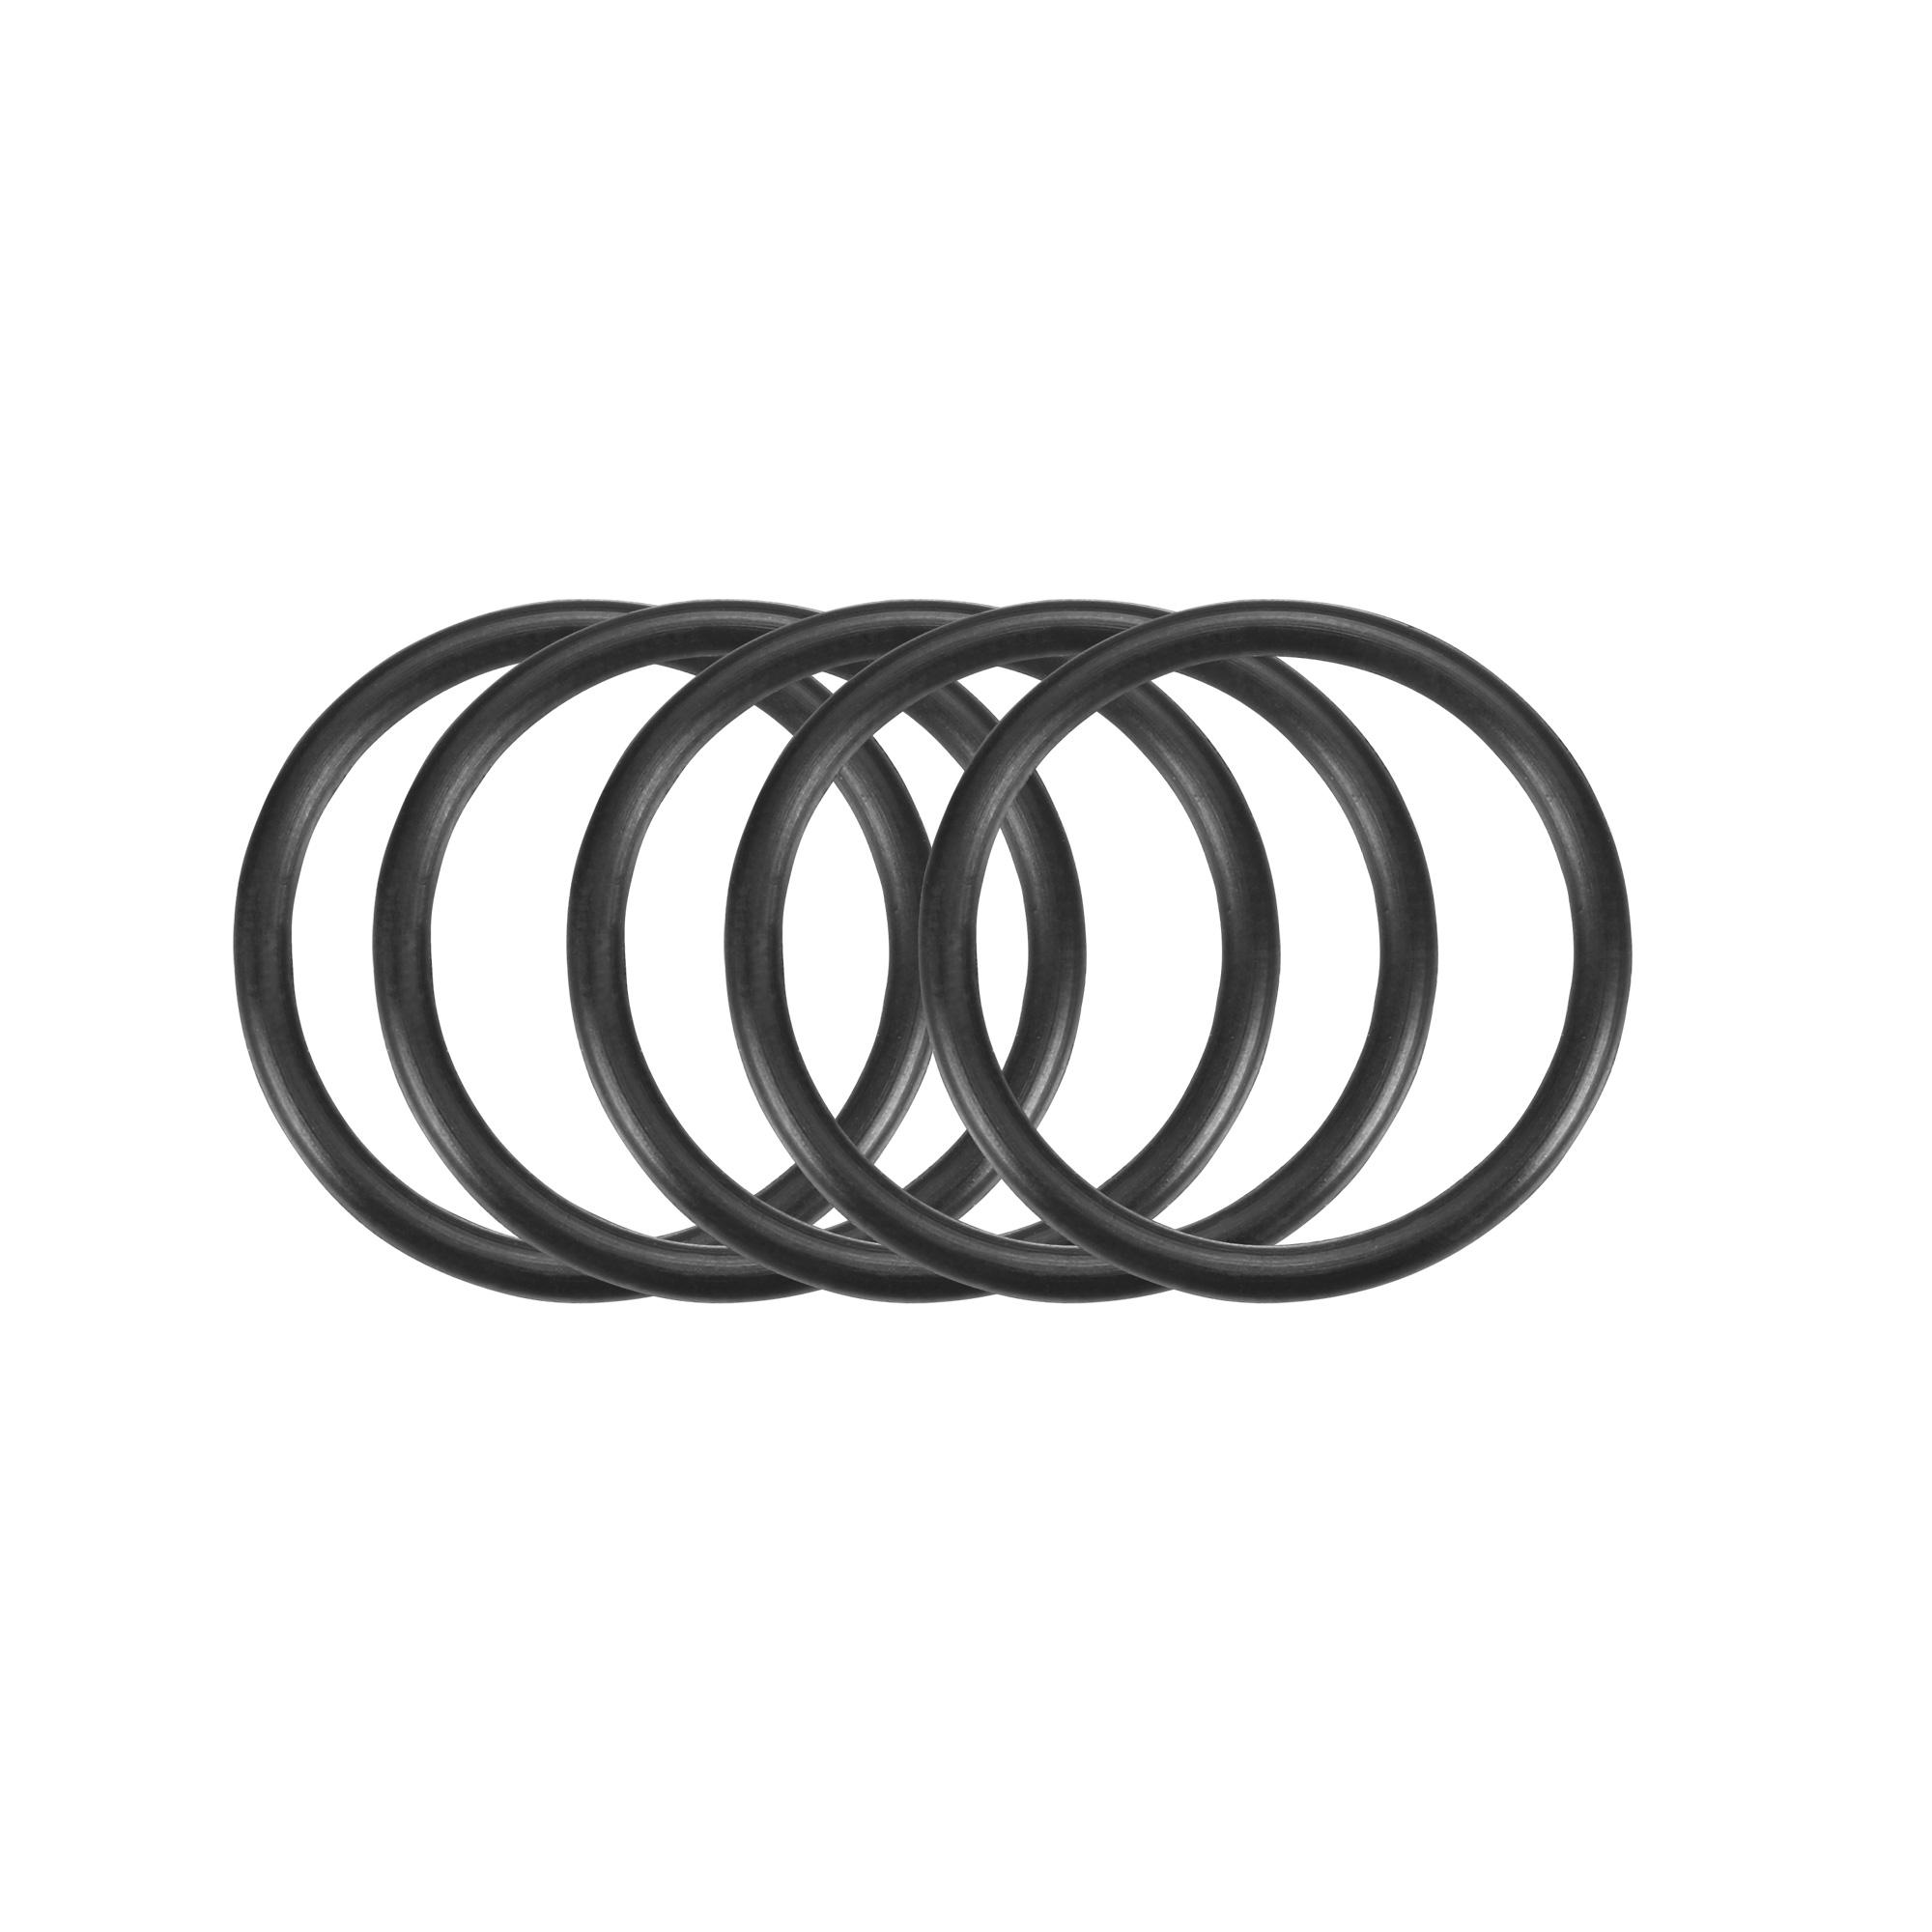 50Pcs Black 24 x 2mm Industrial Flexible Rubber O Ring Oil Sealing Grommets